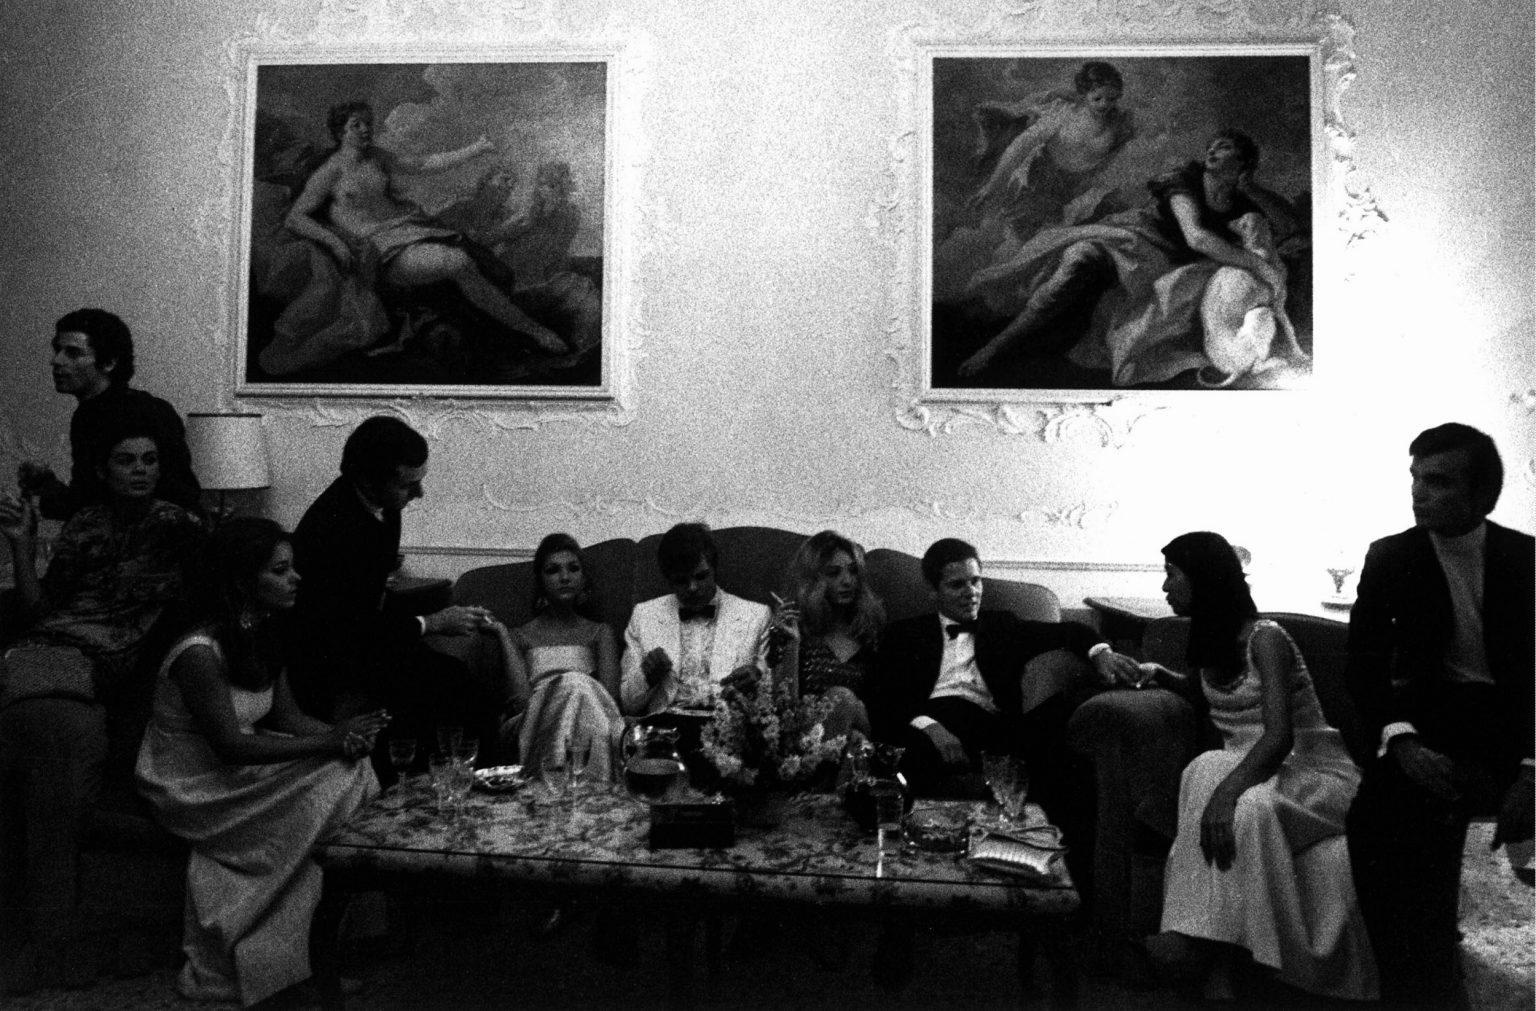 "VENICE 1960 - IN A RICH HOUSE -  VENEZIA 1960 - IN UNA CASA DI RICCHI<p><span style=""color: #ff0000""><strong>*** SPECIAL   FEE   APPLIES ***</strong></span></p> *** Local Caption *** 00097827"